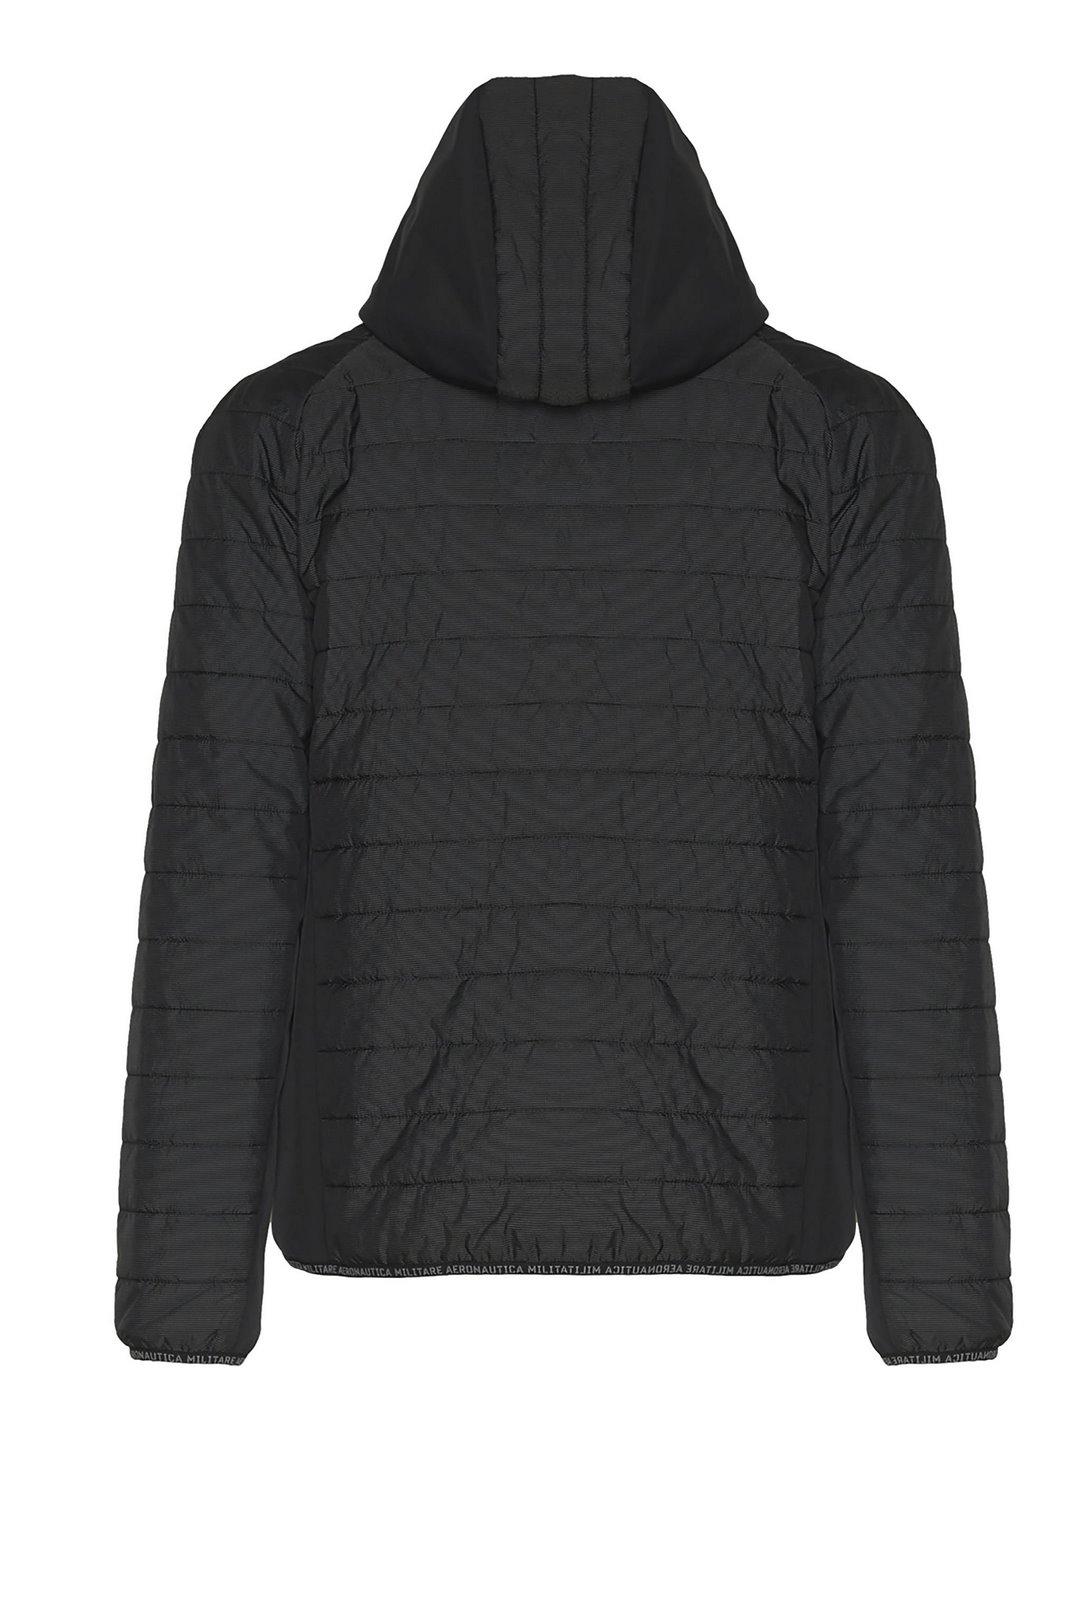 Jacket with Fellex padding               2